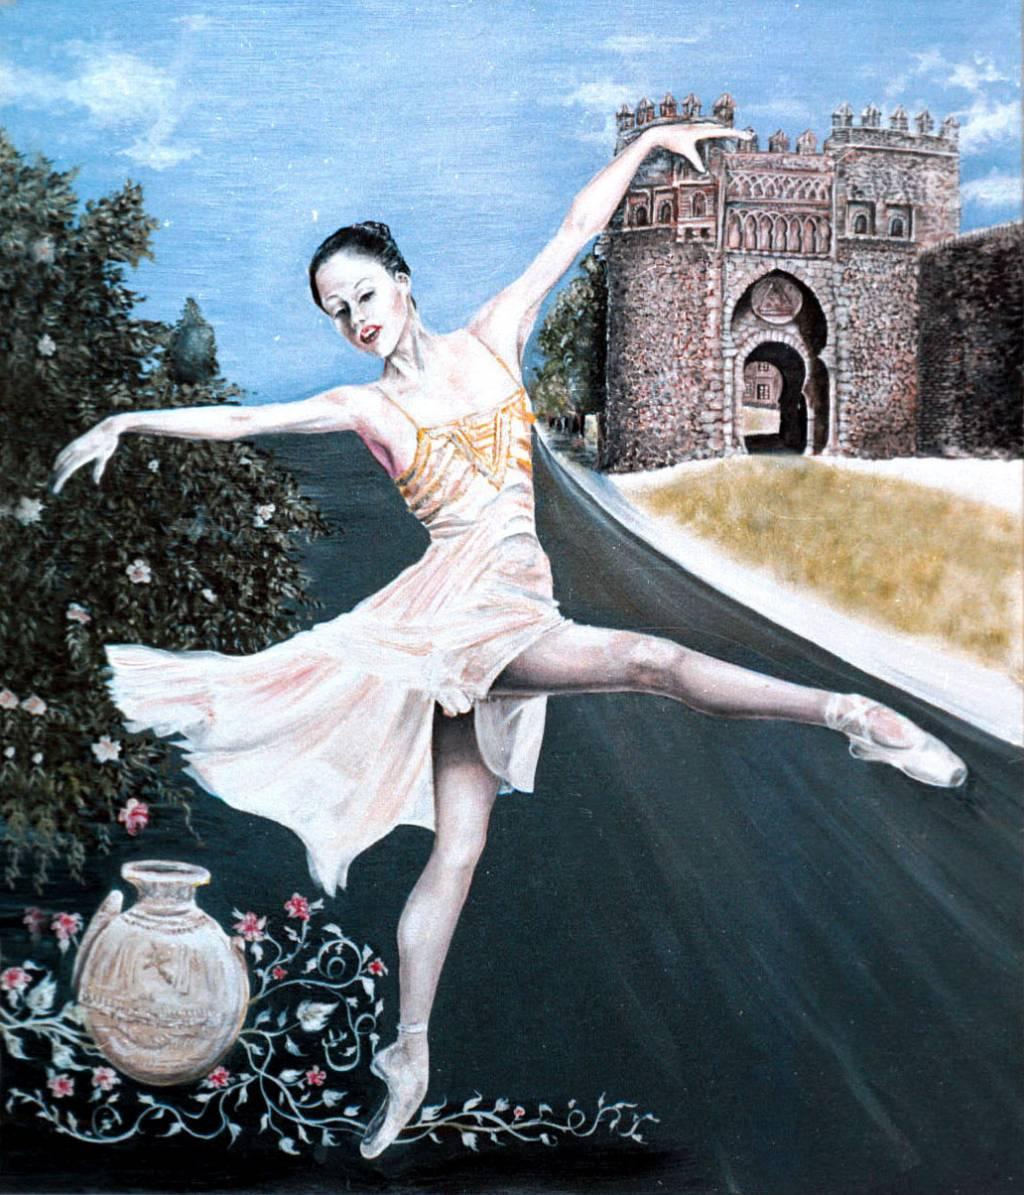 Paloma en la puerta del sol marcelo rossetti Obras puerta del sol